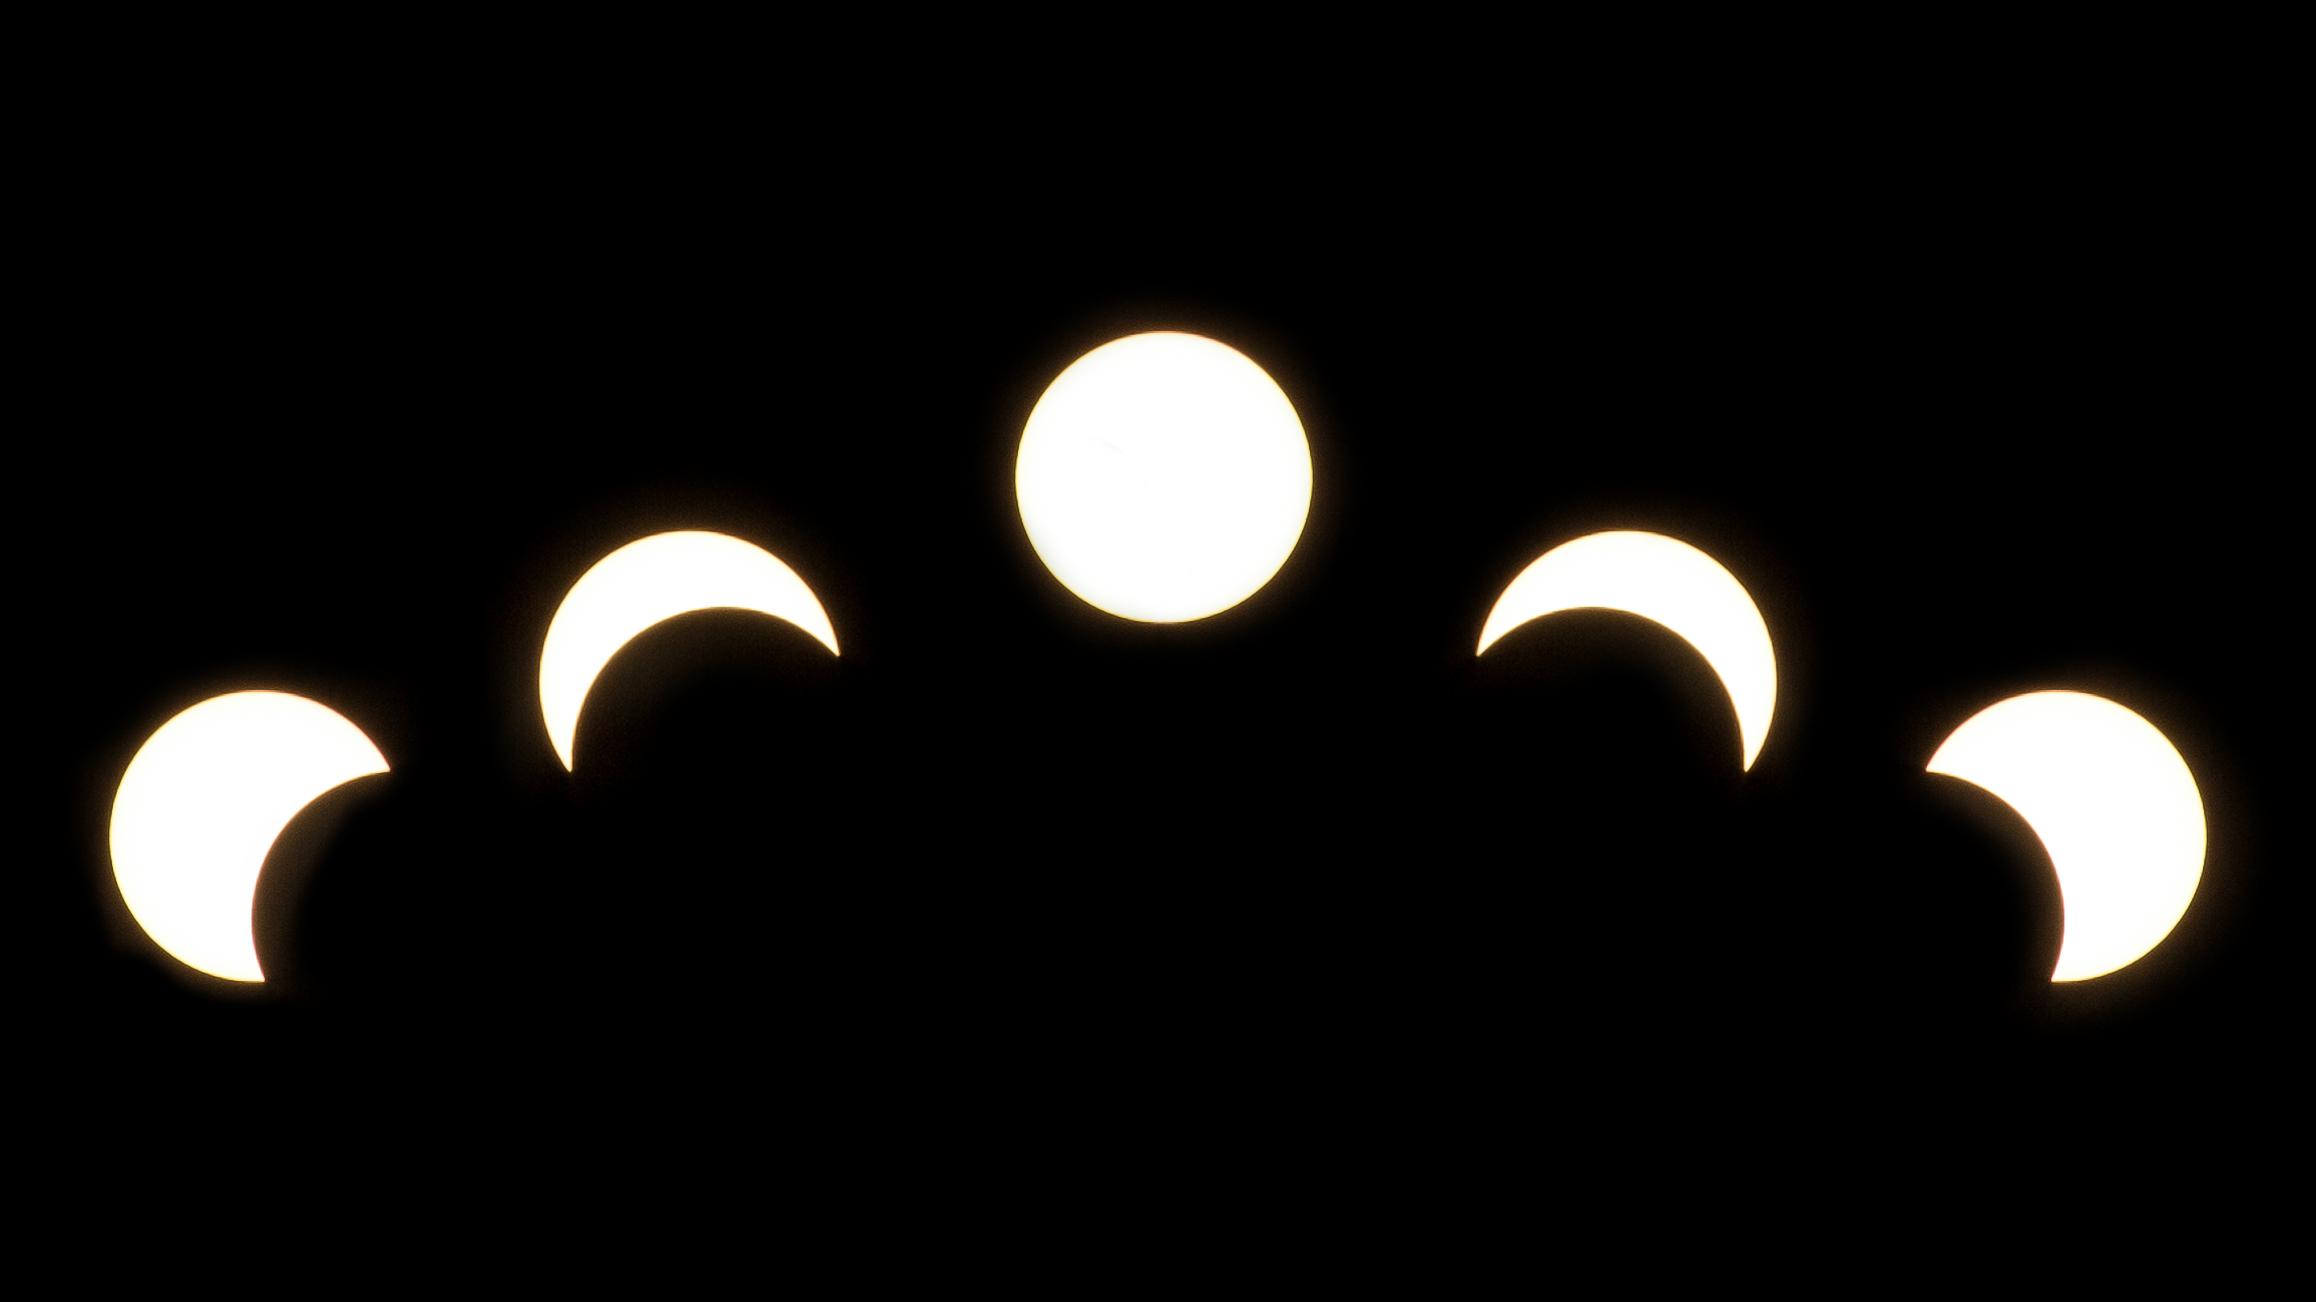 Free Images Moon Eclipse Phase Night Stars Galaxy Sun